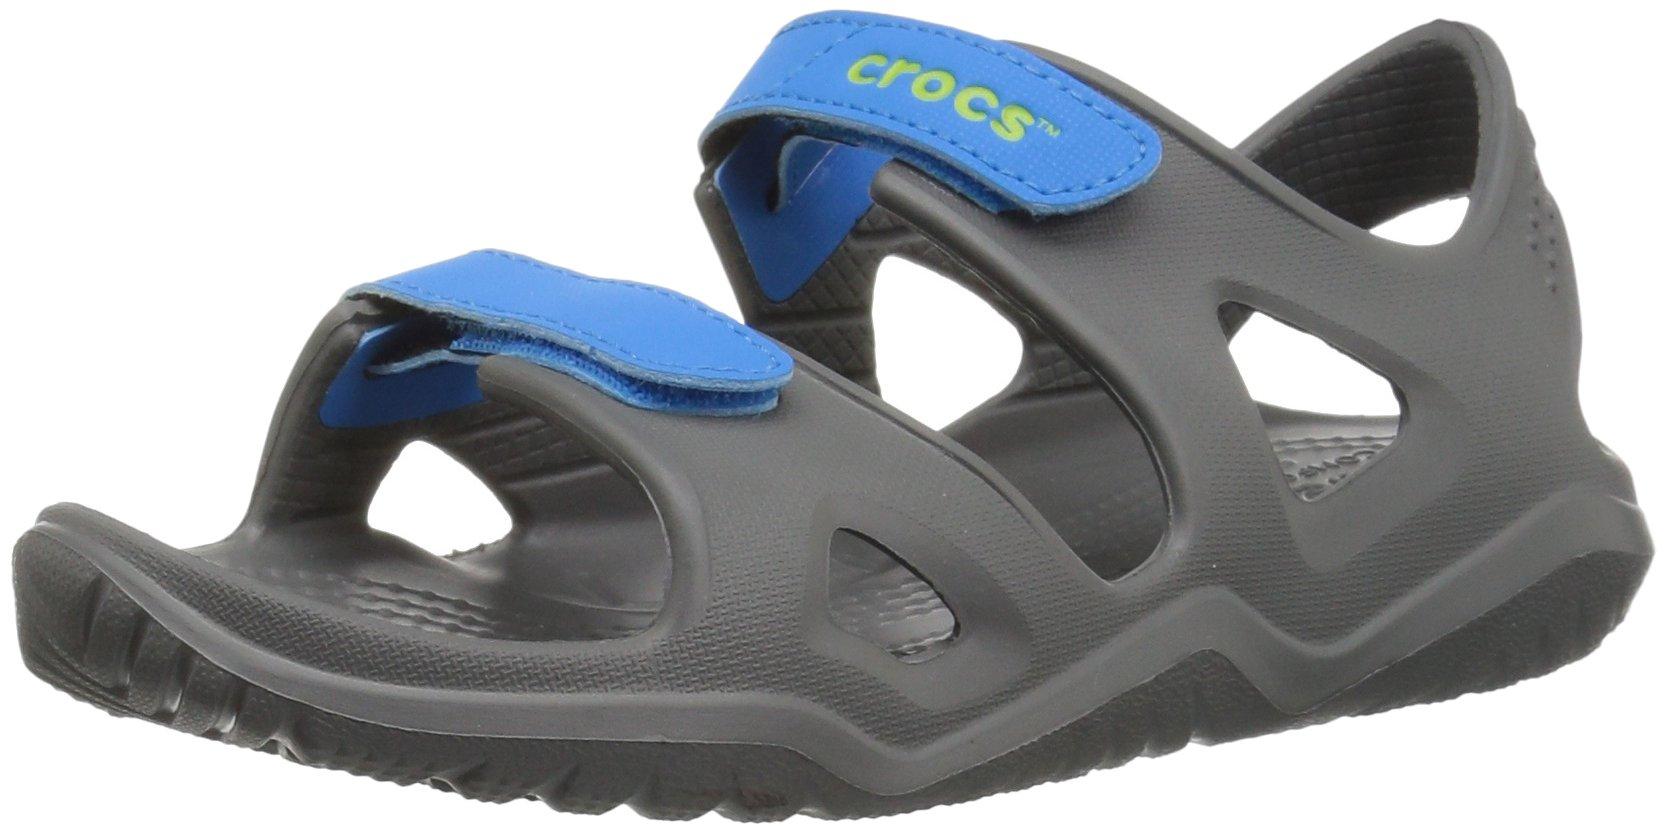 Crocs unisex-kids Swiftwater River Sandal Sandal, Grey, 7 M US Toddler